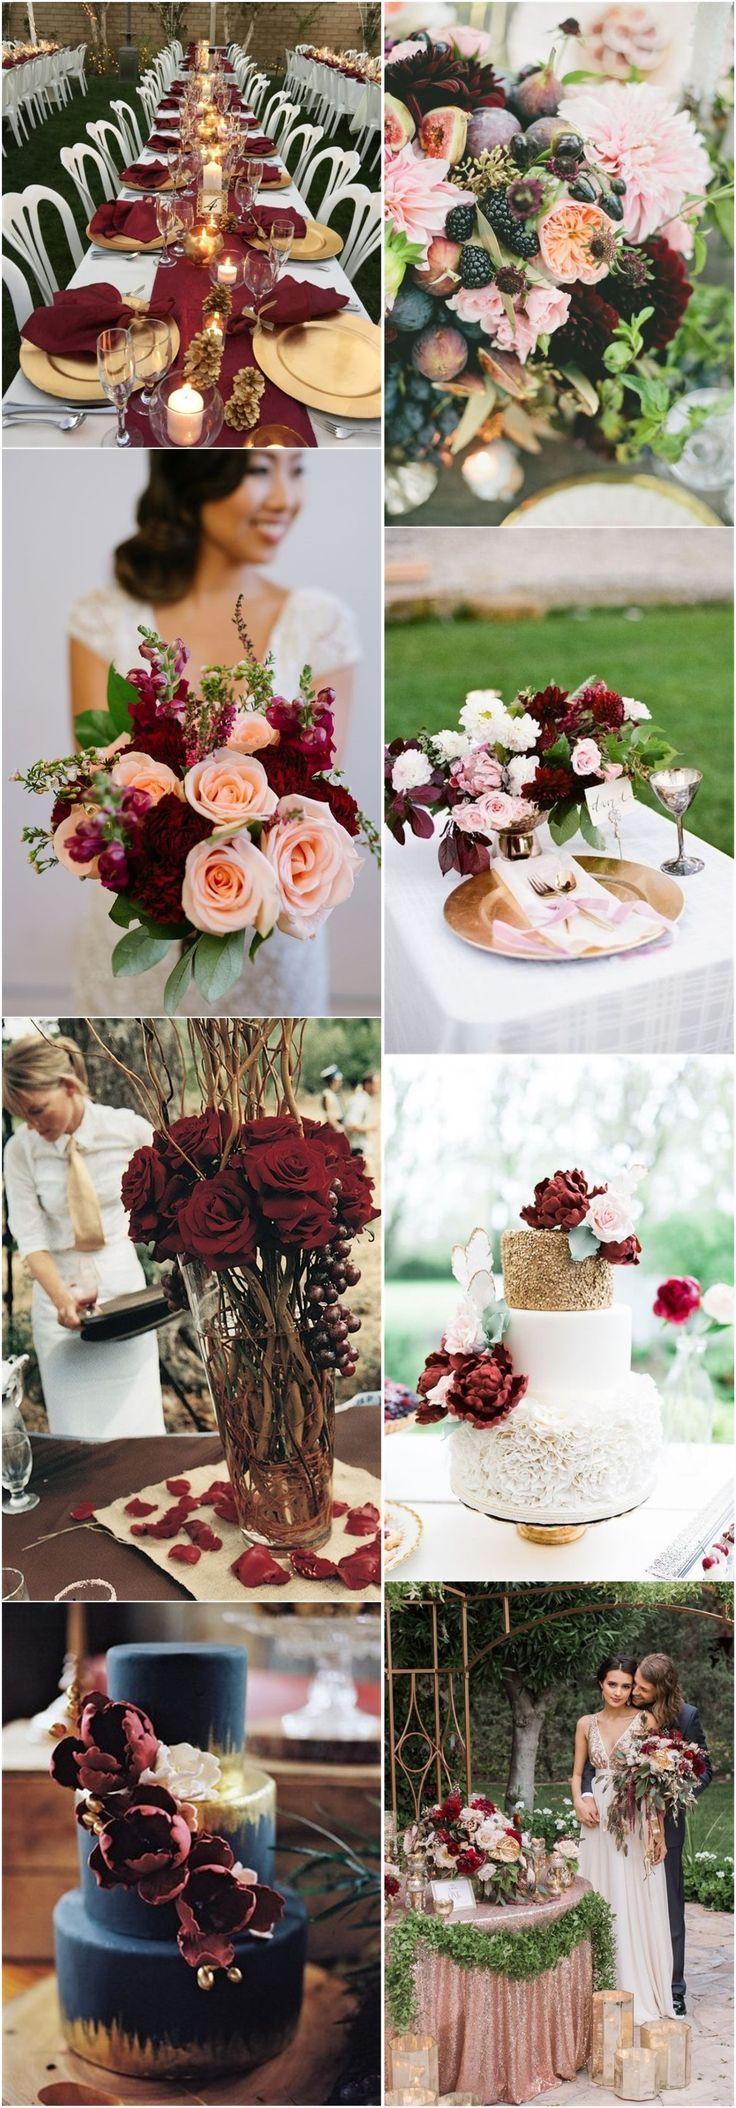 22 Romantic Burgundy and Rose Gold Fall Wedding Ideas #fallweddingideas